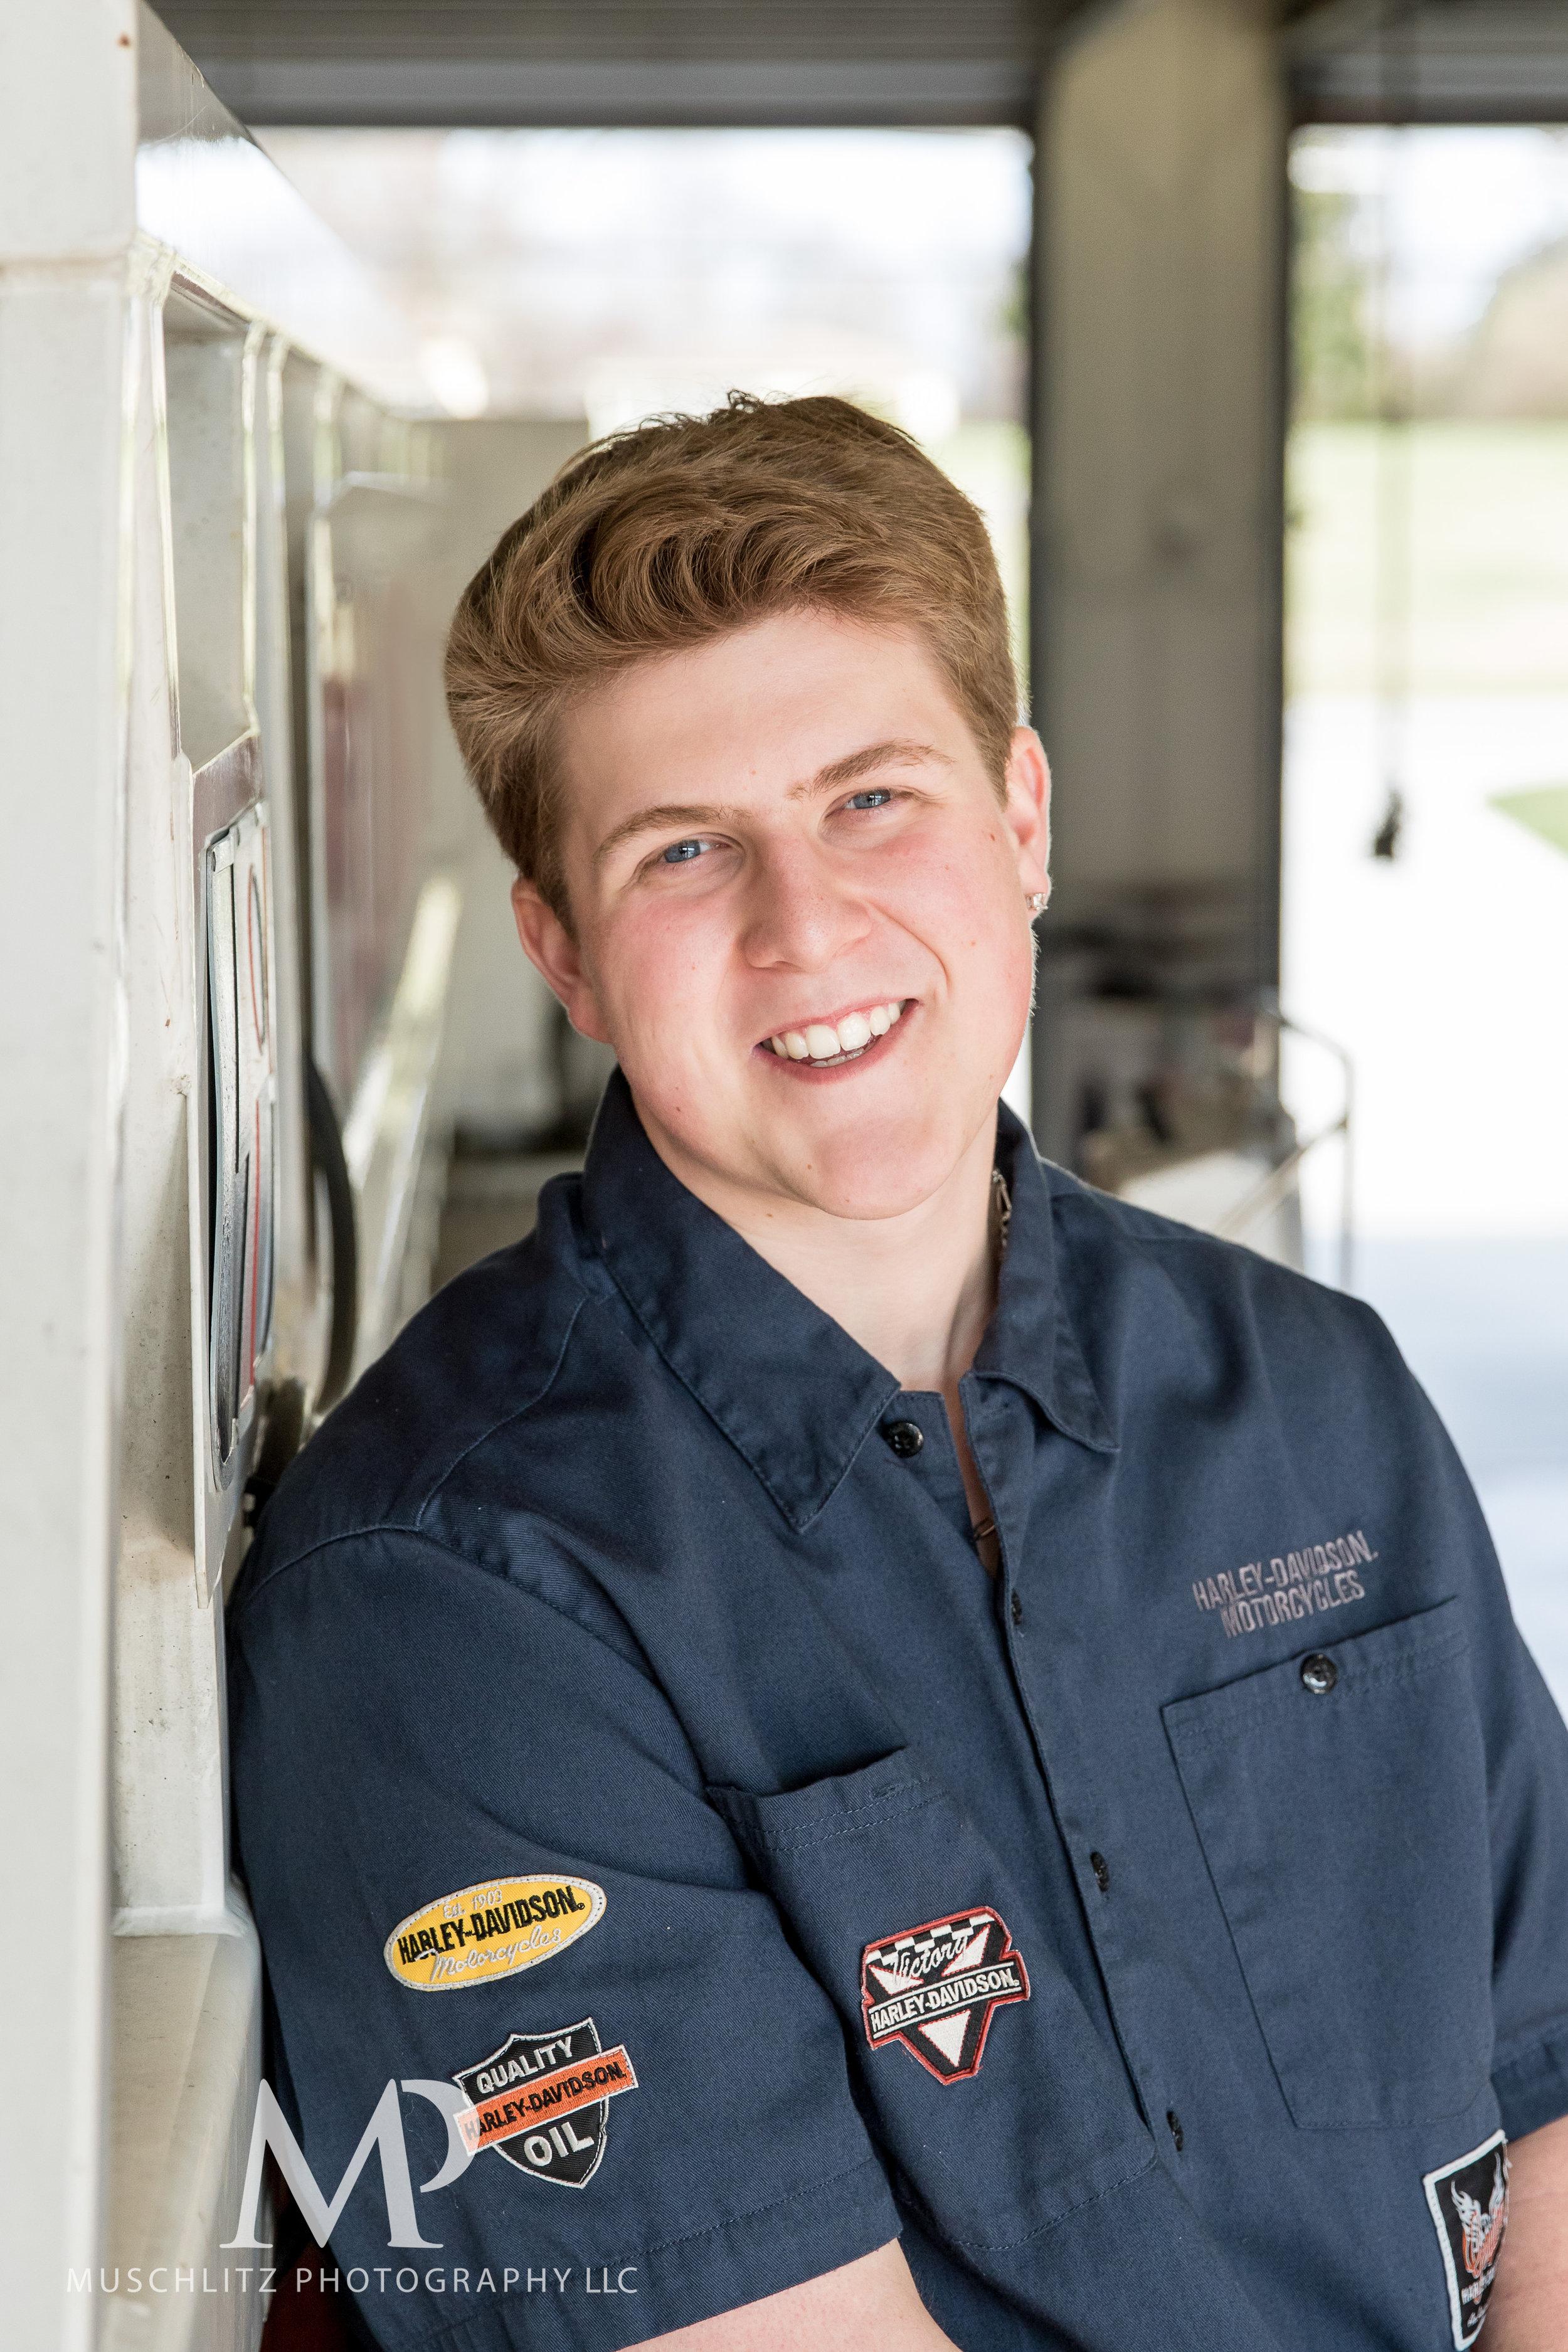 senior-portrait-fire-station-fireman-gahanna-columbus-photographer-studio-016.JPG